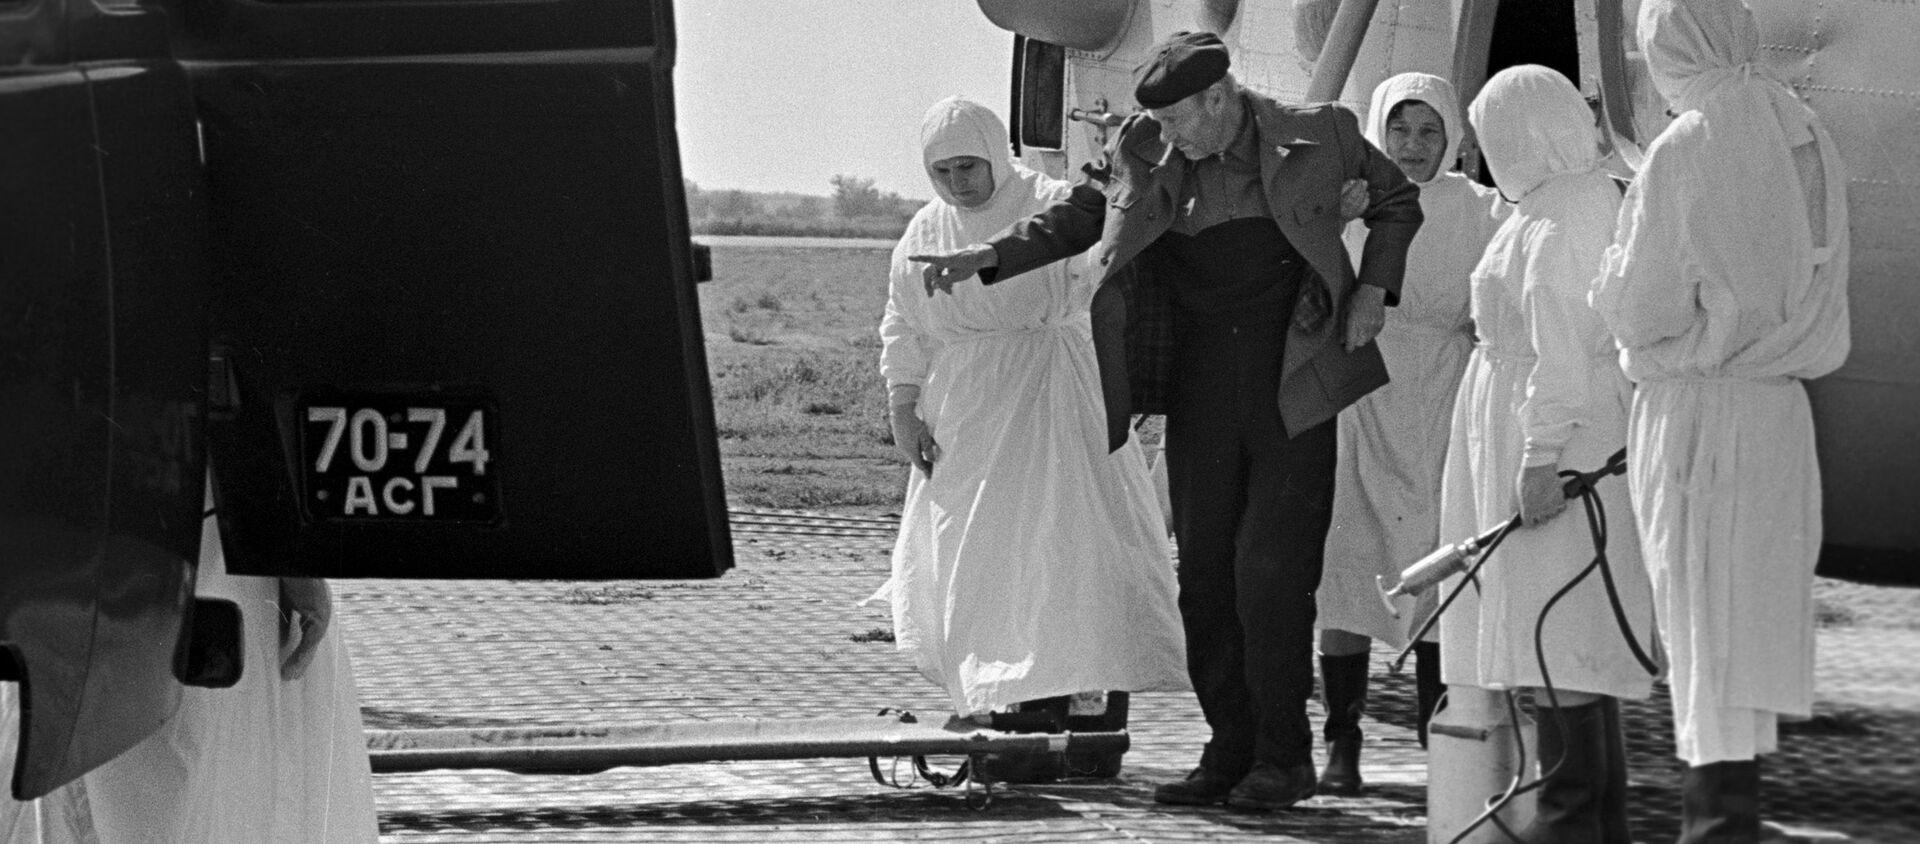 Peste, cólera y gripe: cómo combatían las epidemias en la URSS    - Sputnik Mundo, 1920, 17.04.2020